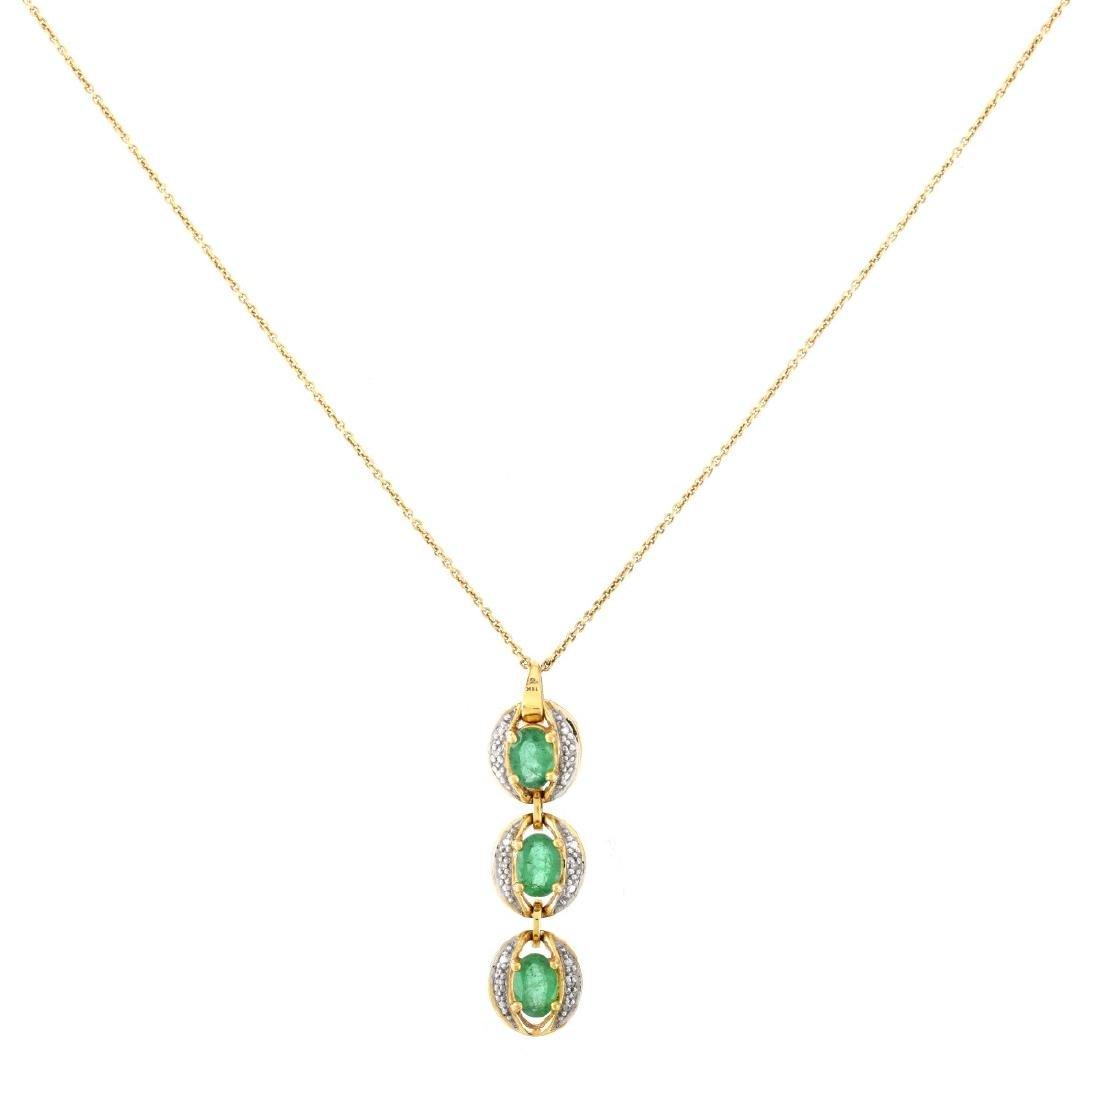 Emerald, Diamond and 18K Gold Pendant Necklace - 2